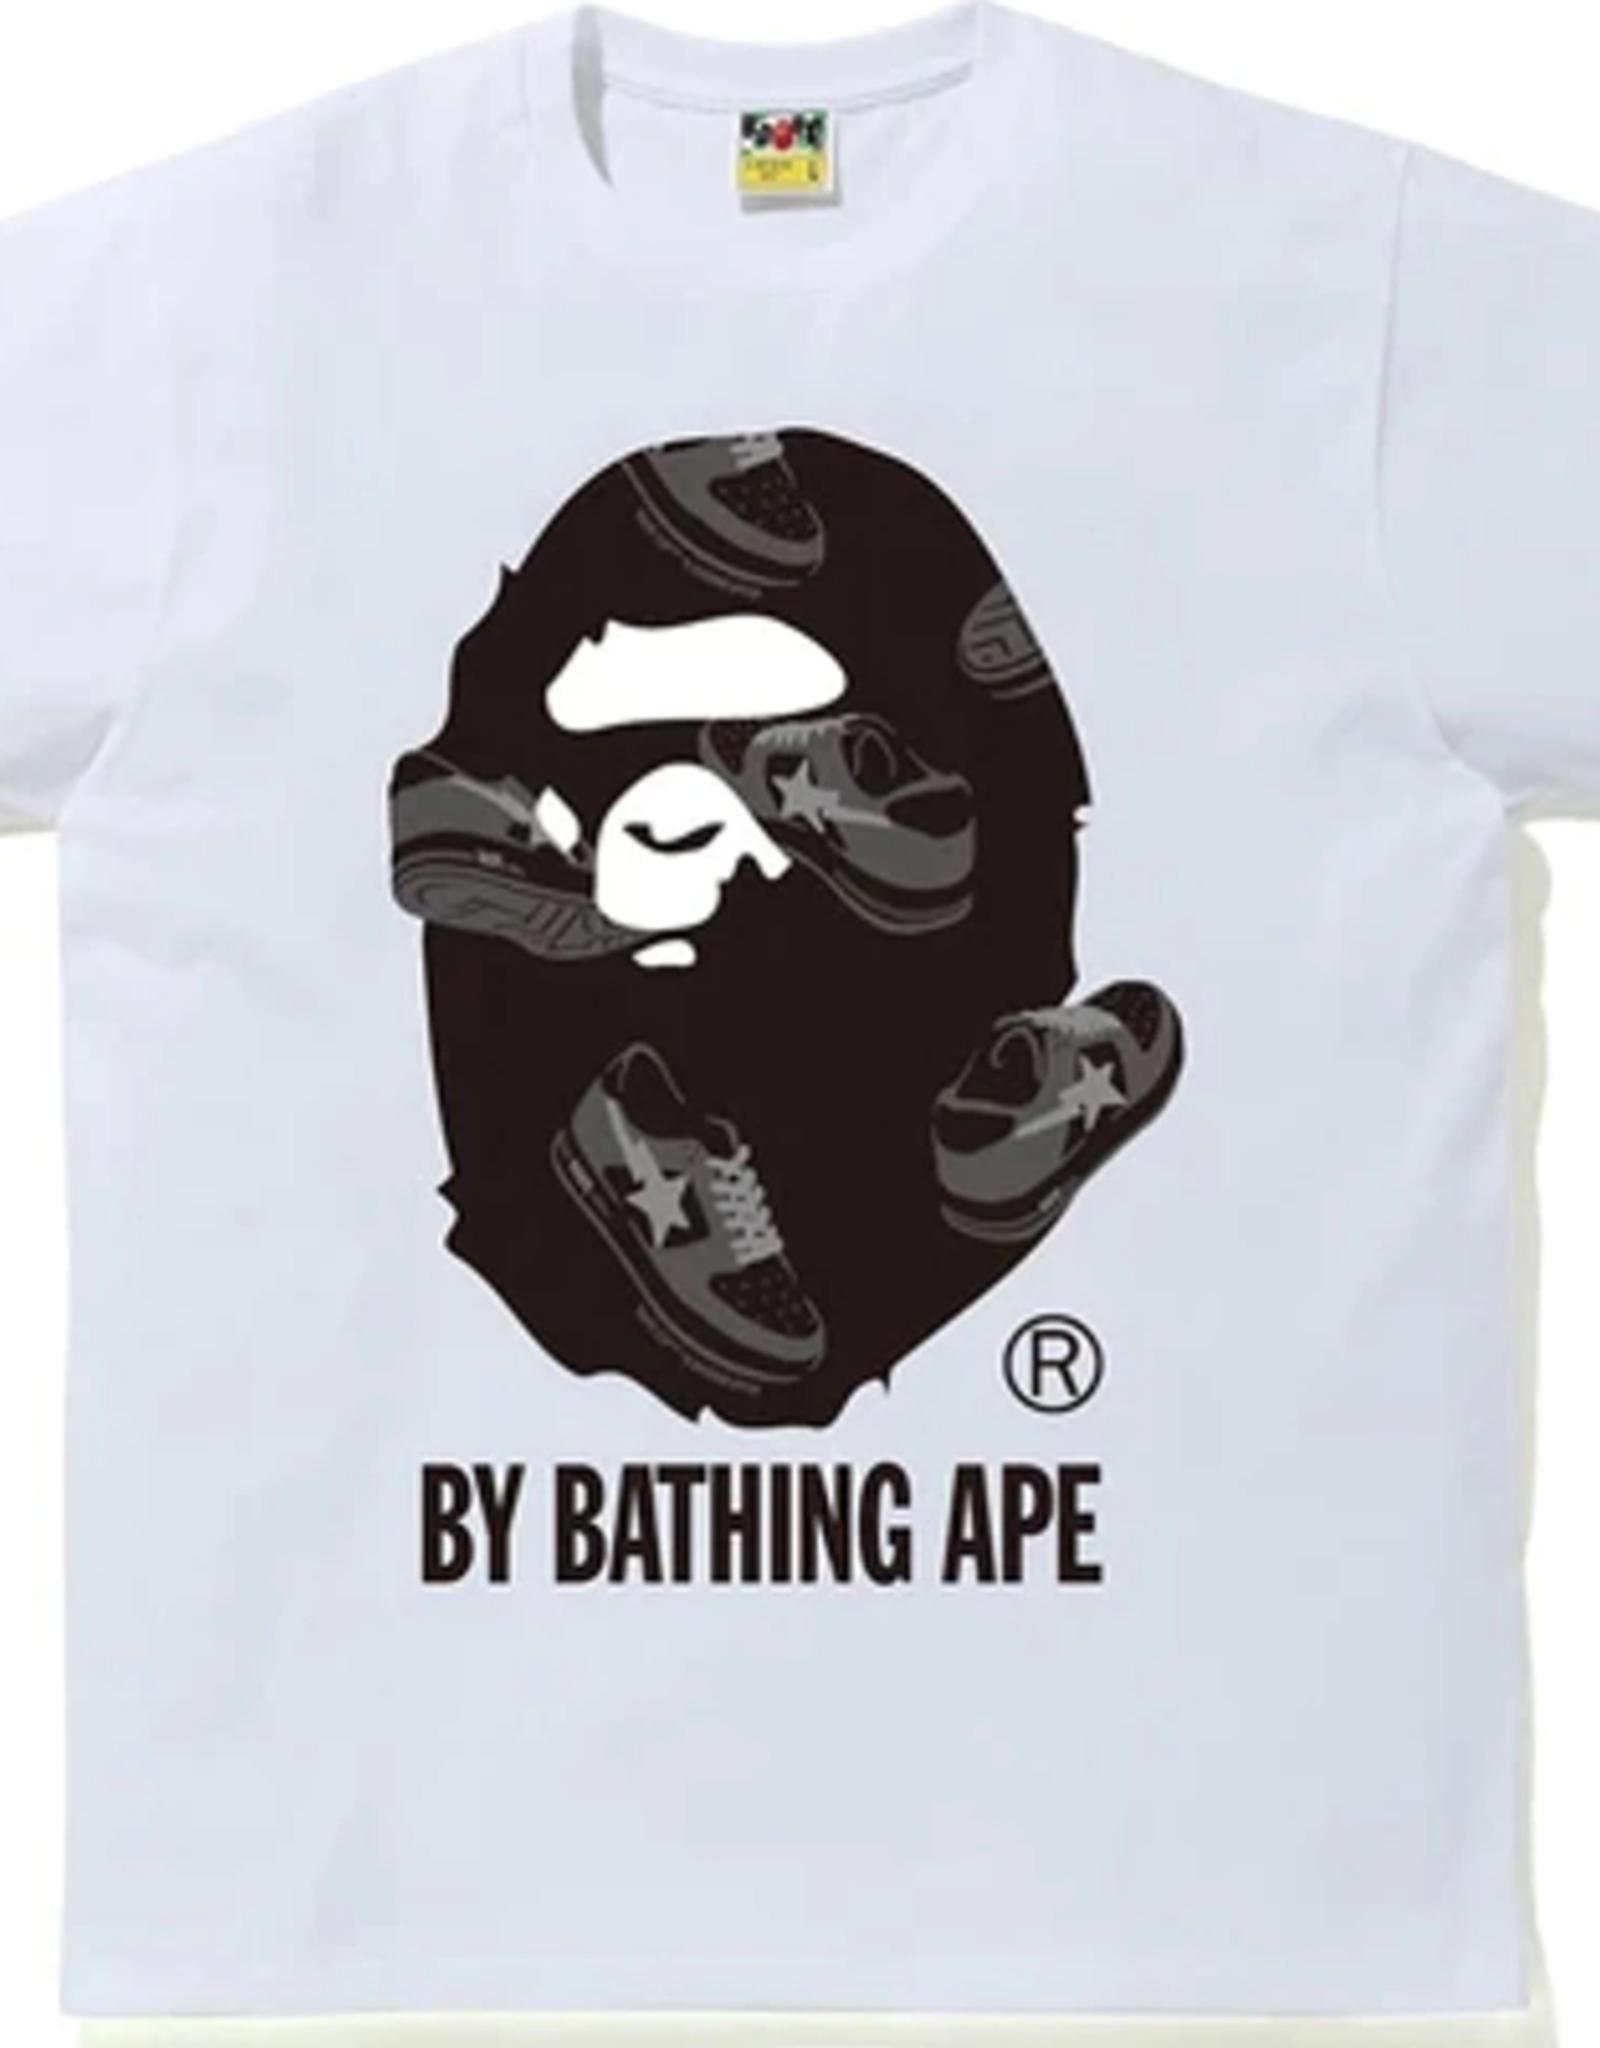 BAPE BAPE Sta Random by Bathing Ape Tee White/Black - XL